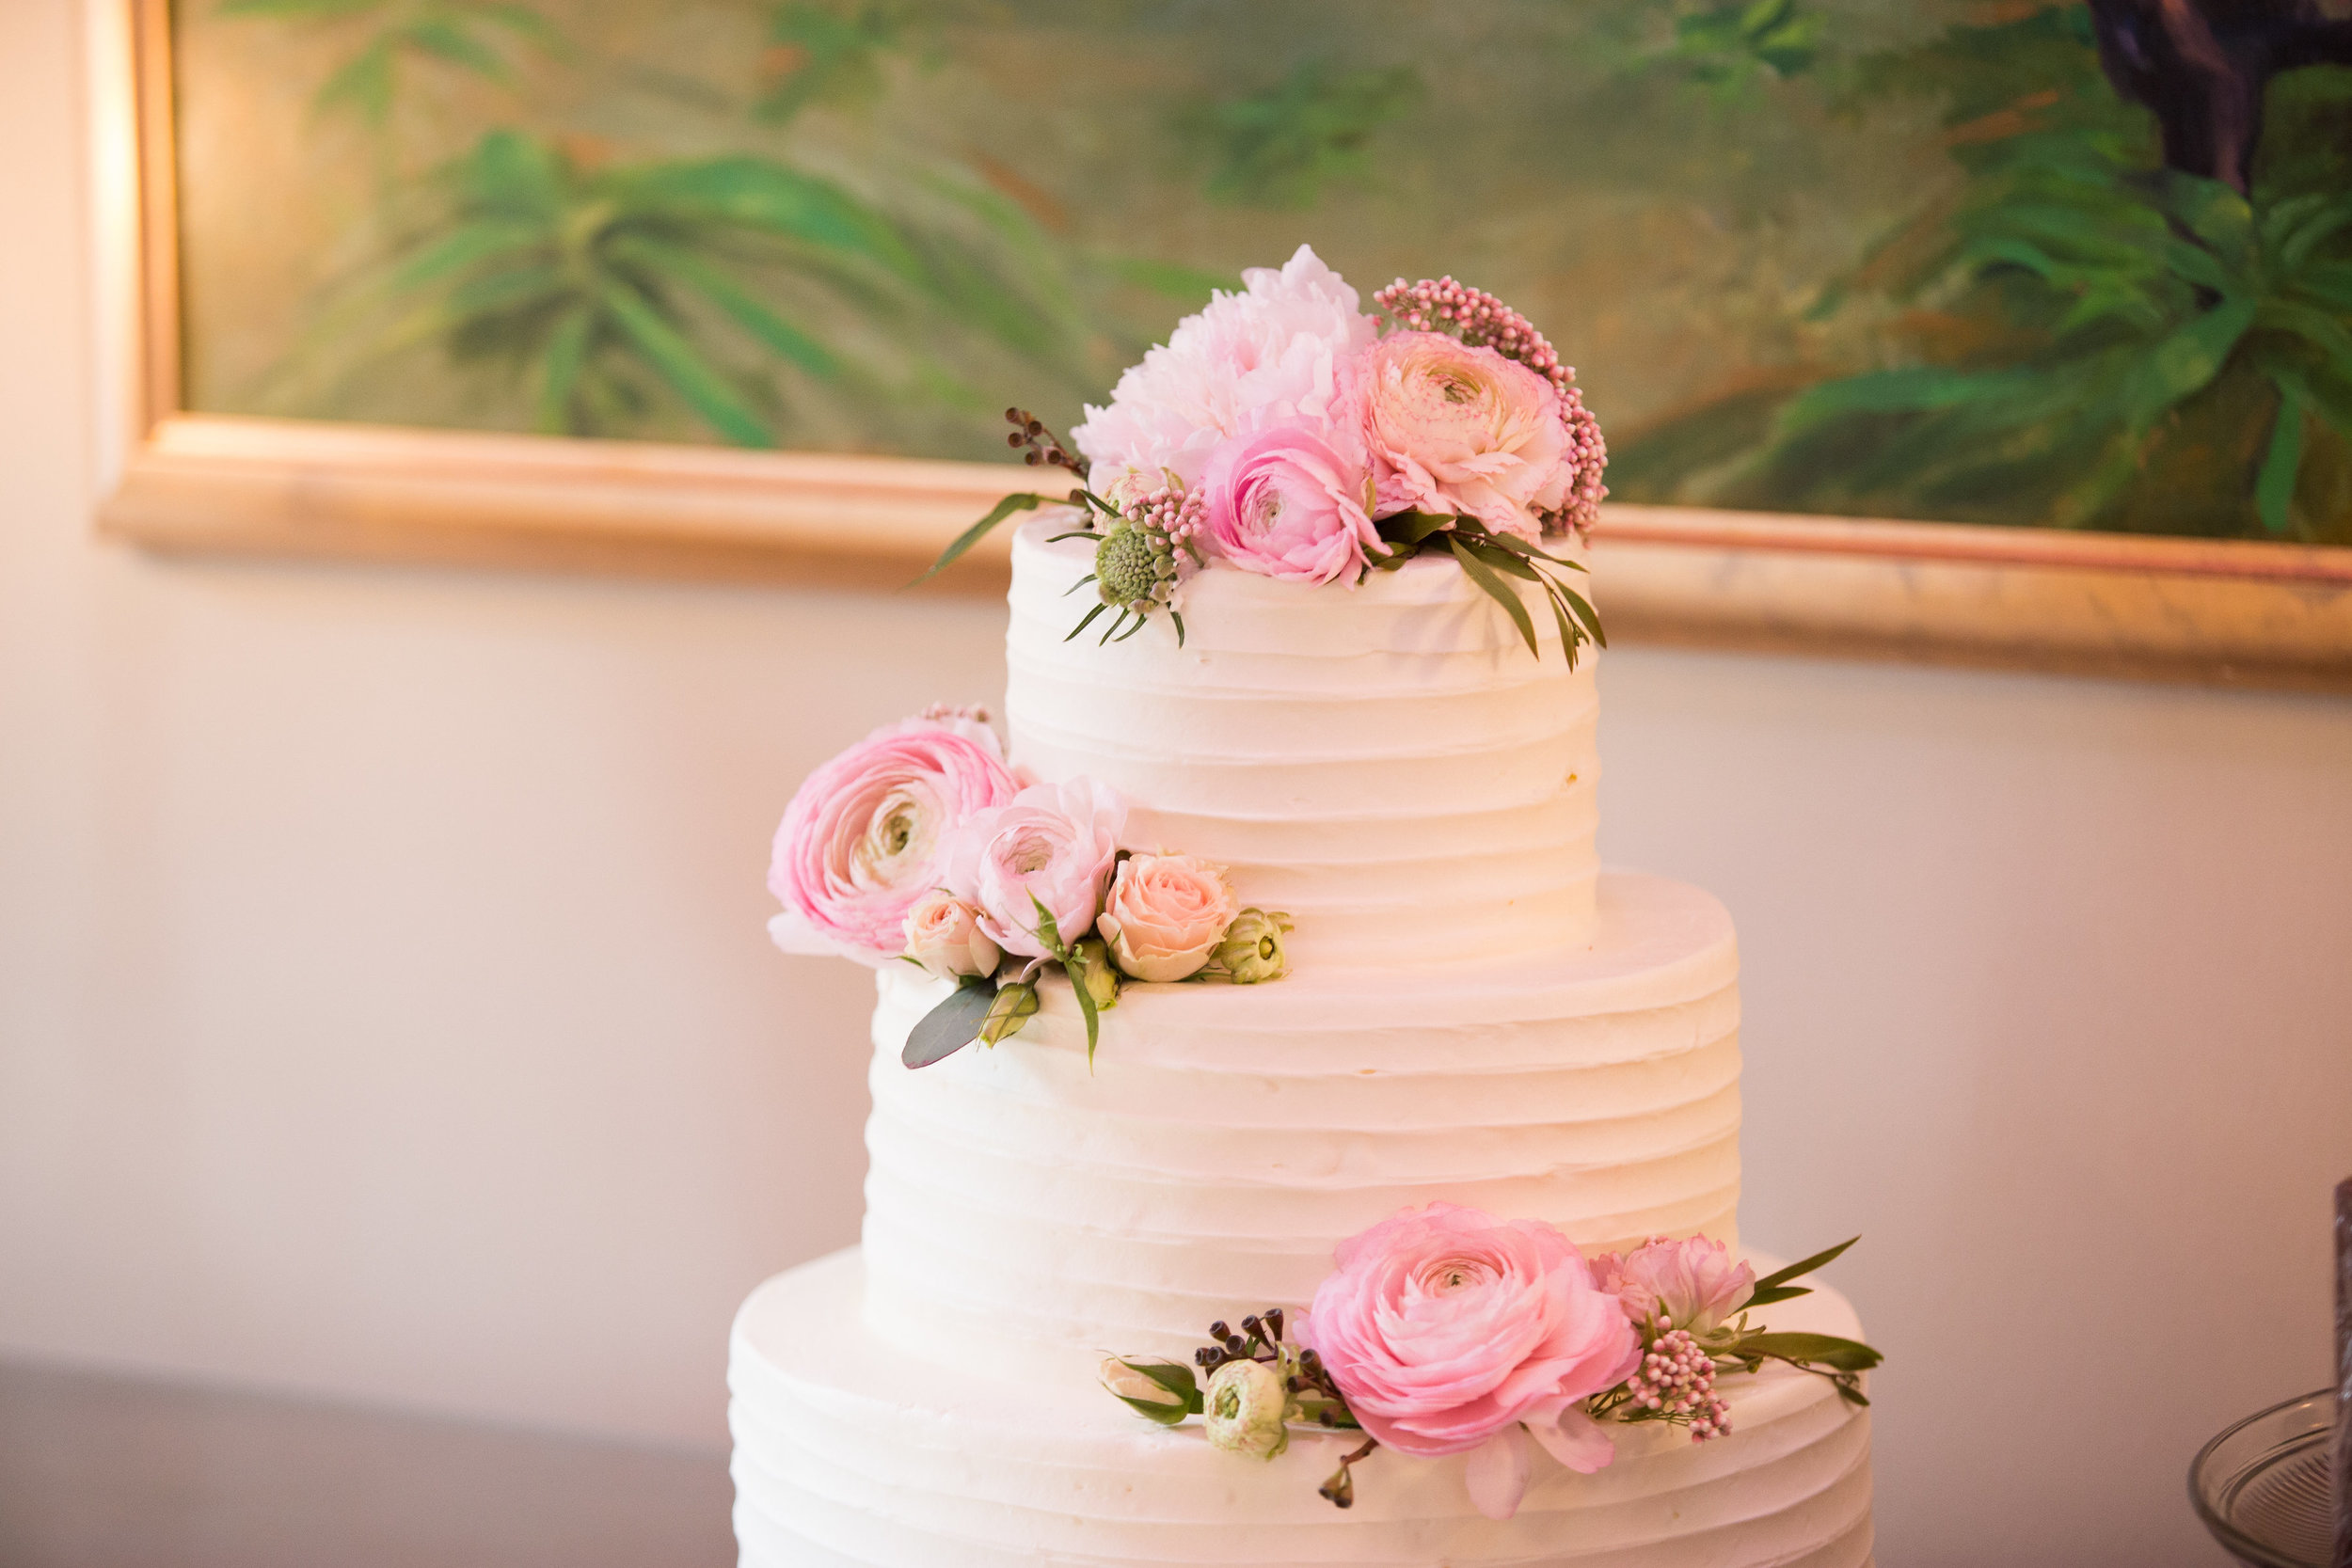 julie-dicarlo-photography-kentlands-mansion-wedding-brielle-davis-events-wedding-cake-sweets-by-e.jpg